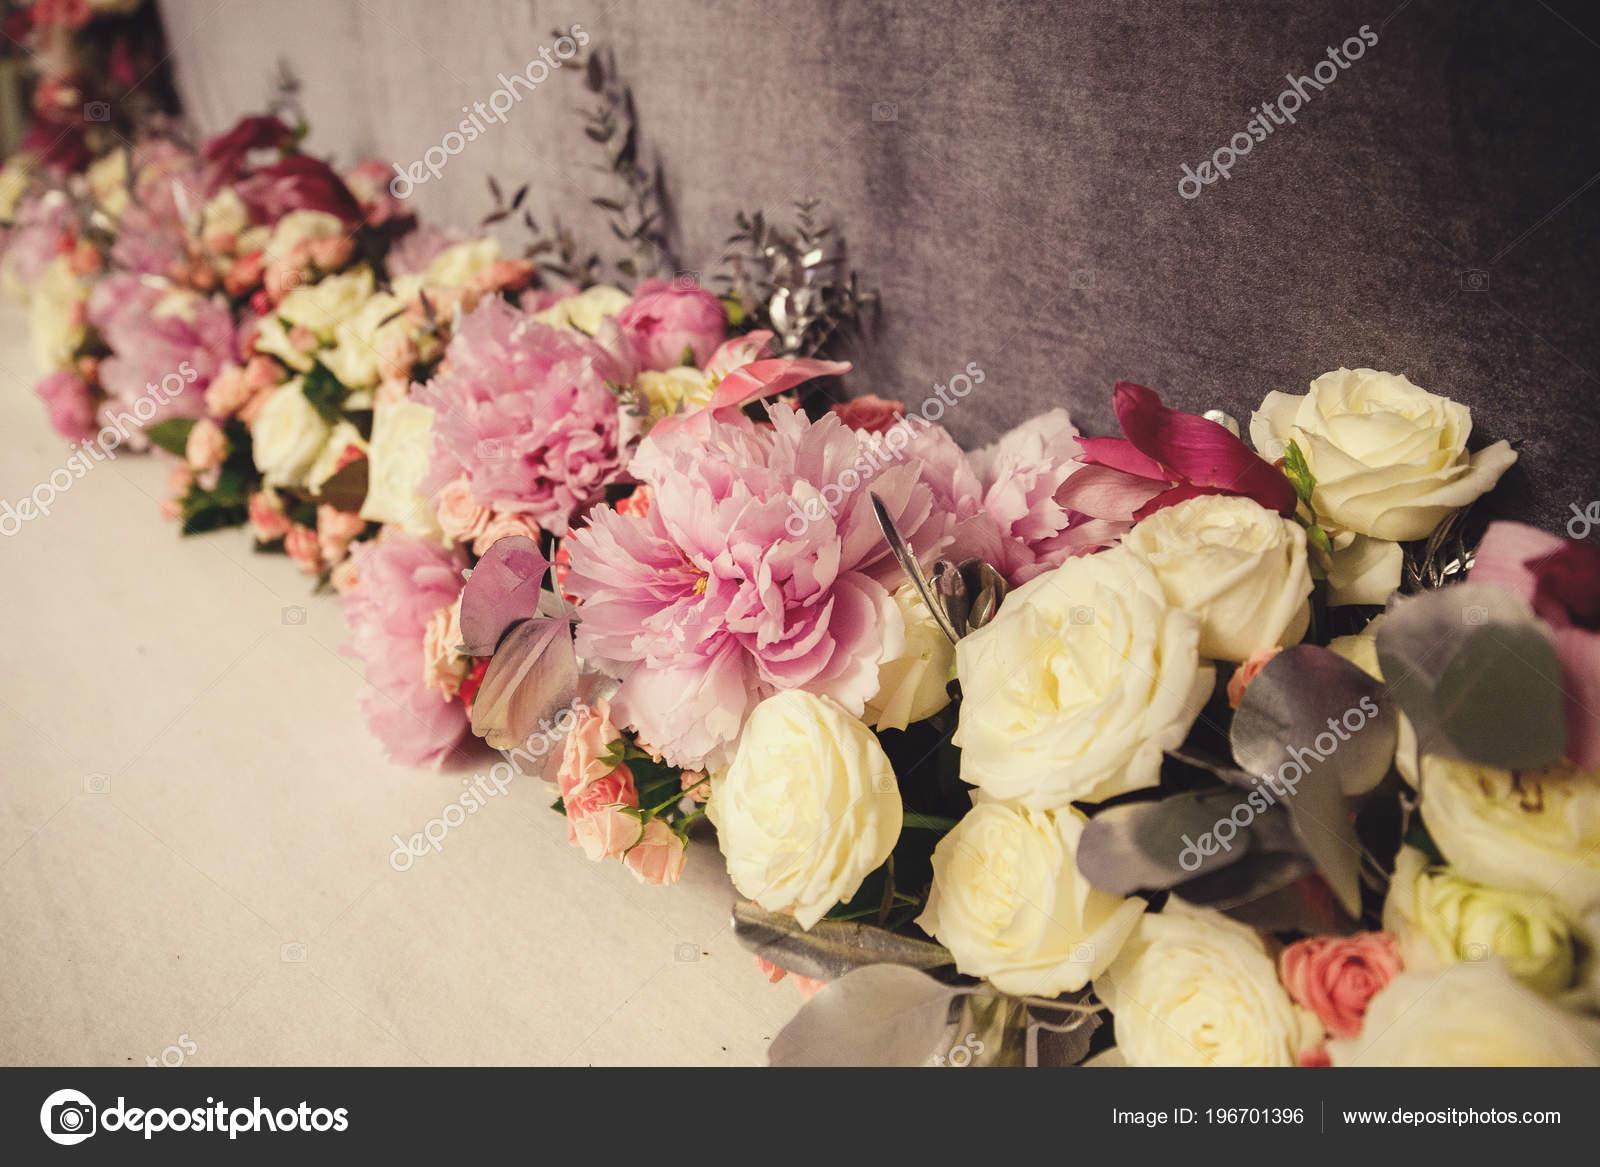 cc992f412570 Στολισμός Γάμου Λουλούδια Για Την Τελετή — Φωτογραφία Αρχείου ...